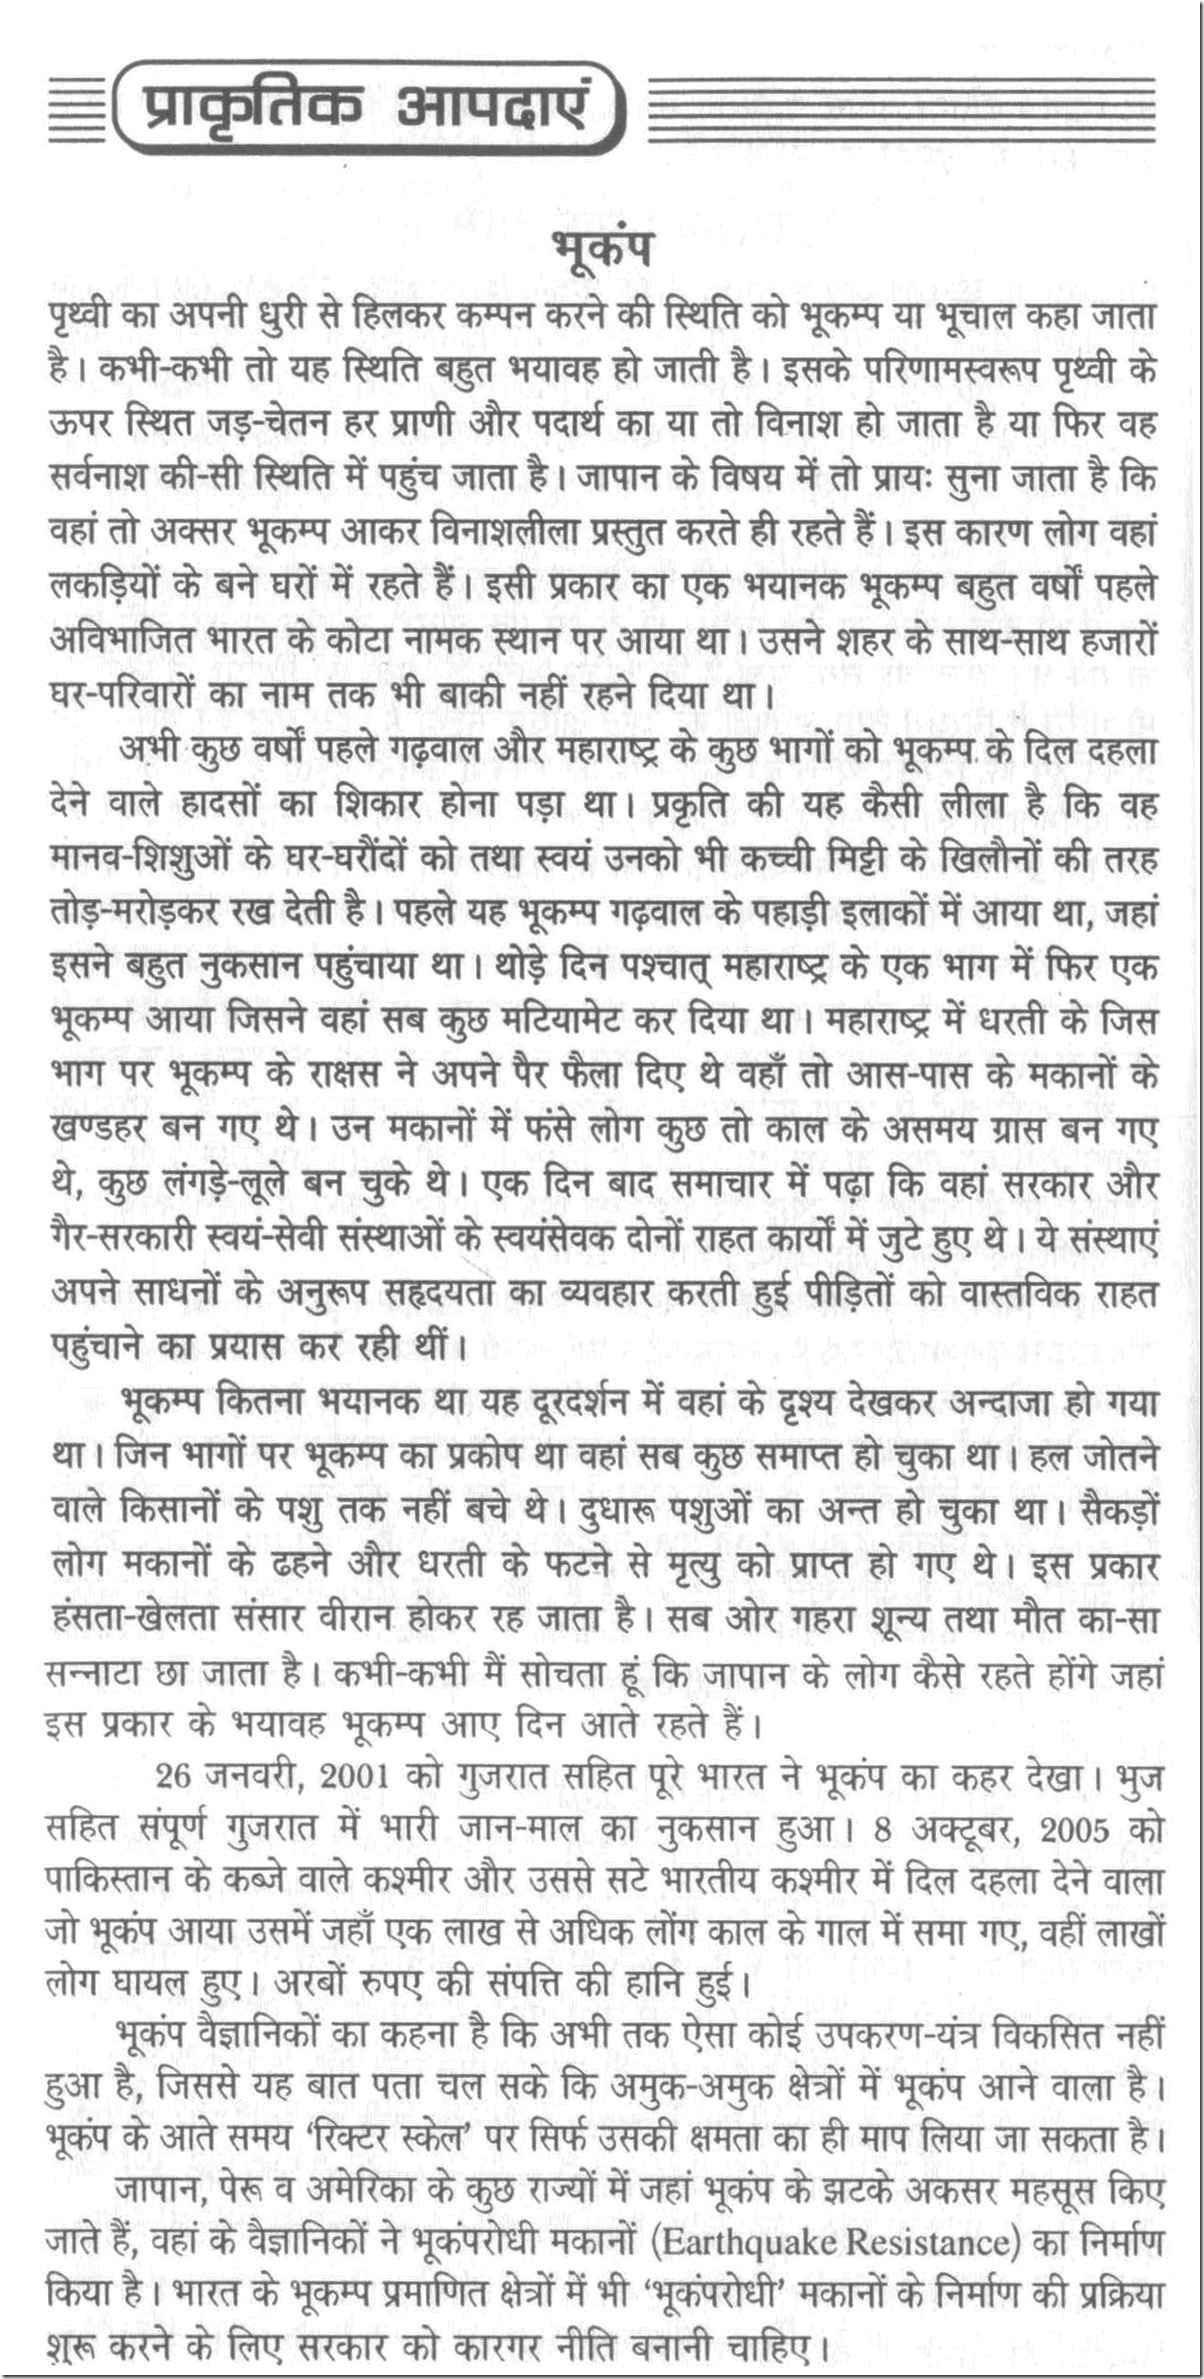 हिंदी निबंध संग्रह Hindi nibandh sangrah 3